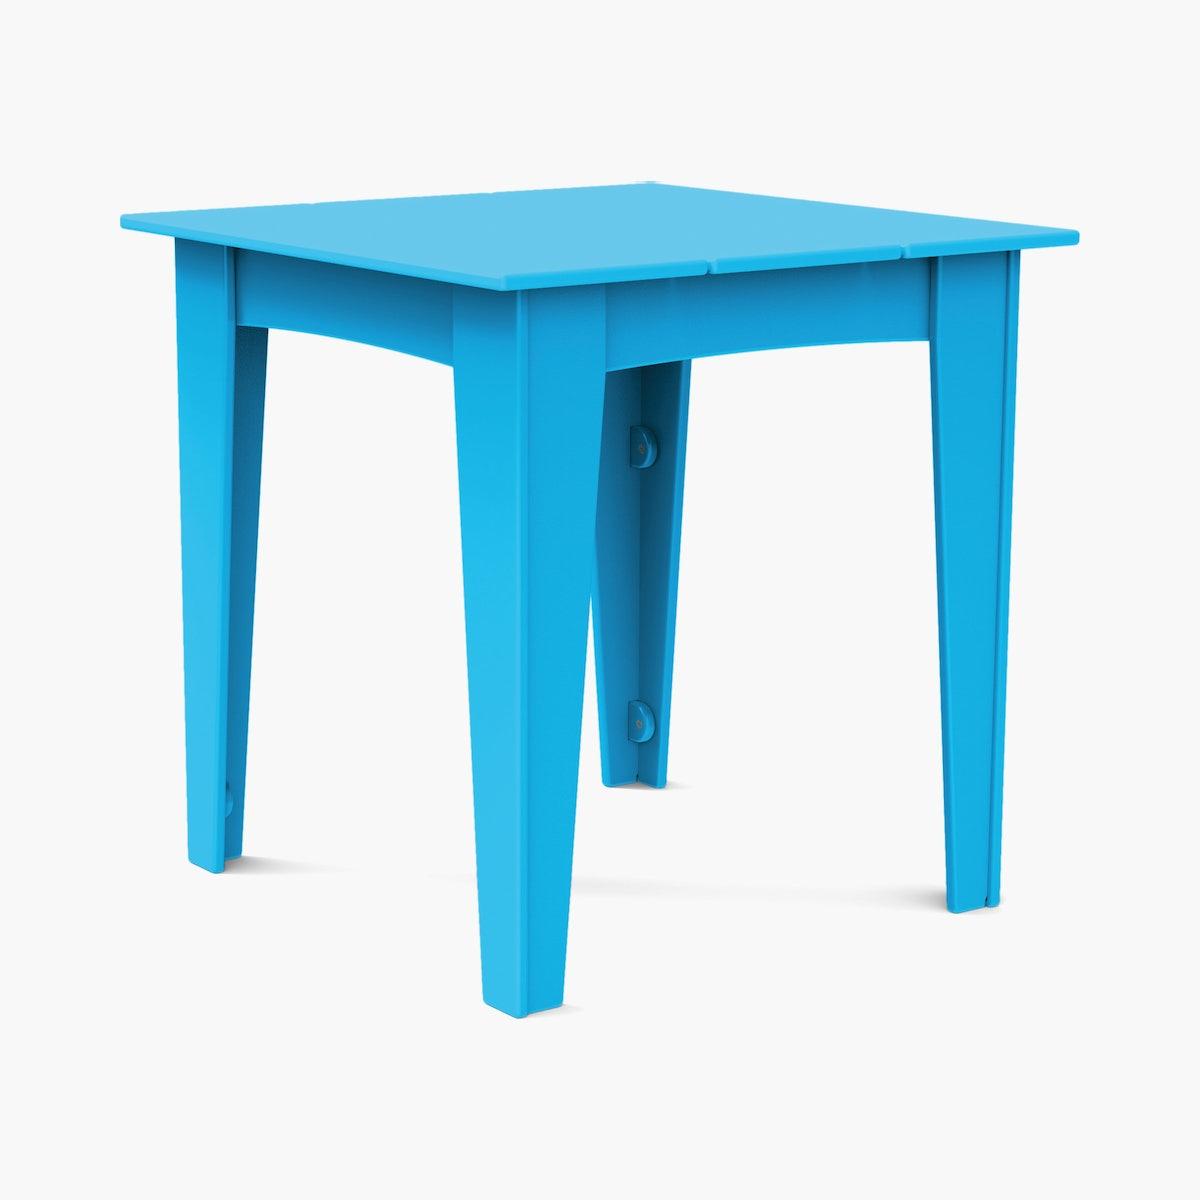 Alfresco Table